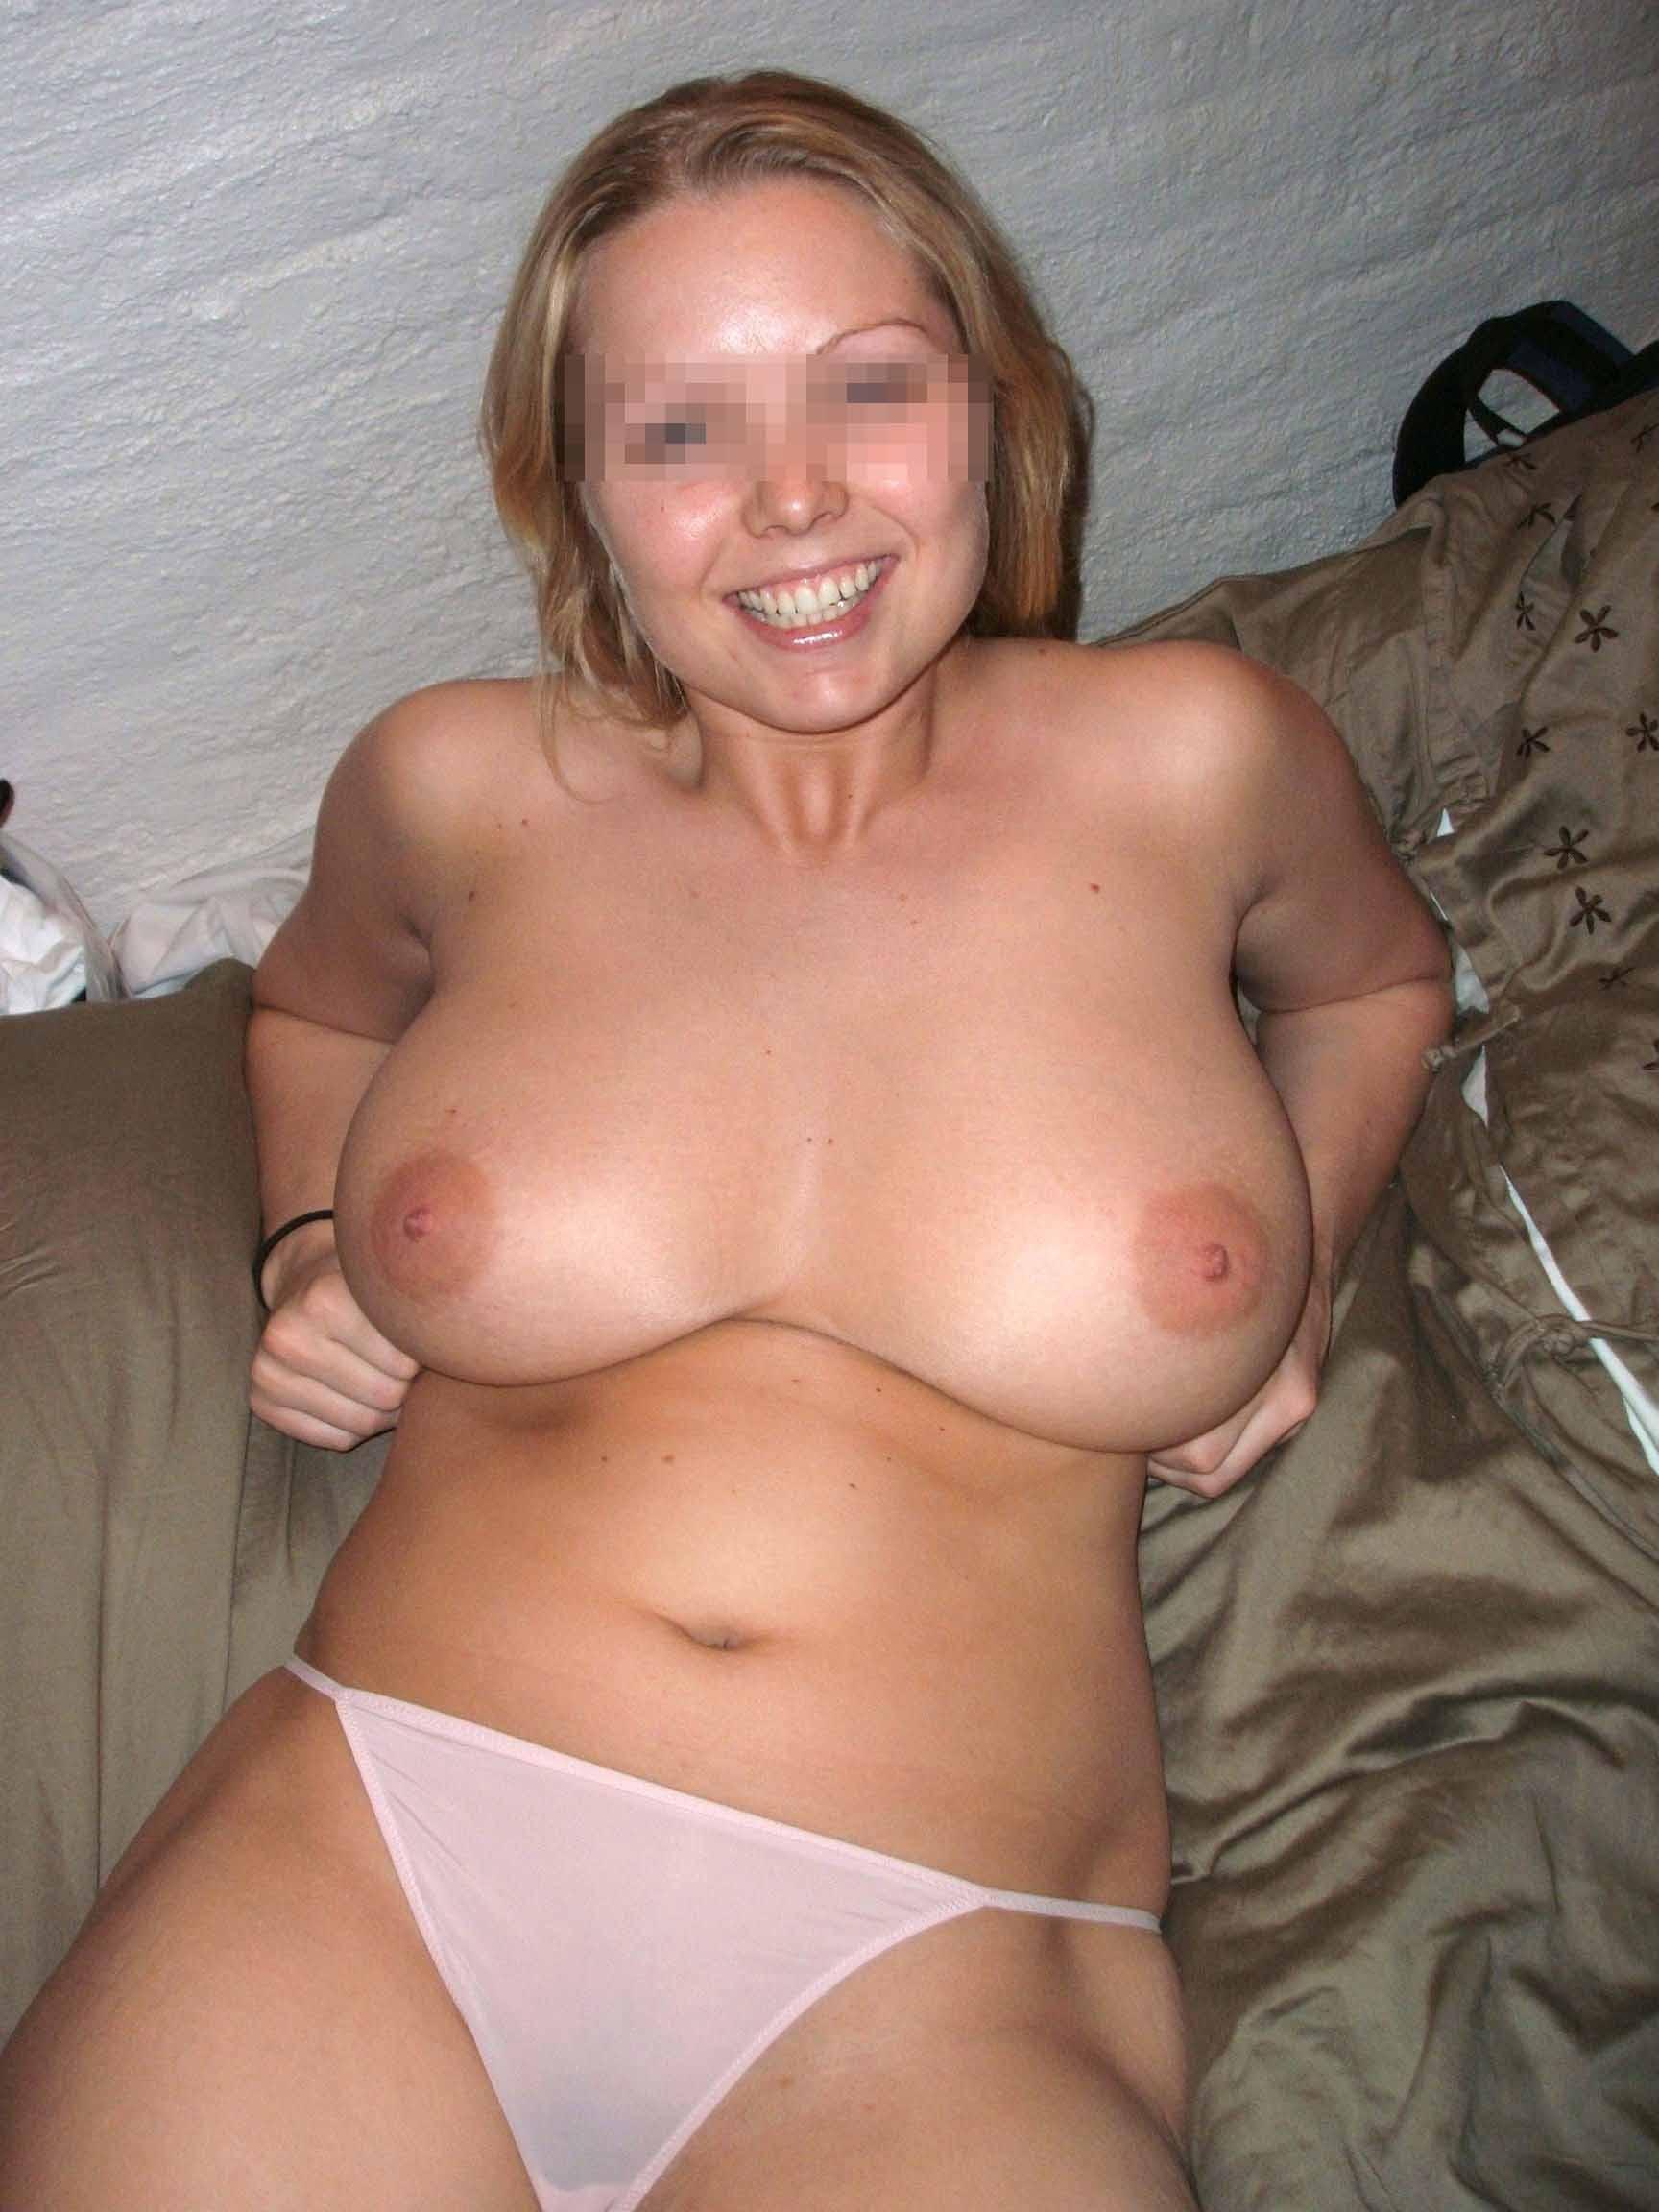 Mature big floppy tits boobs adult videos